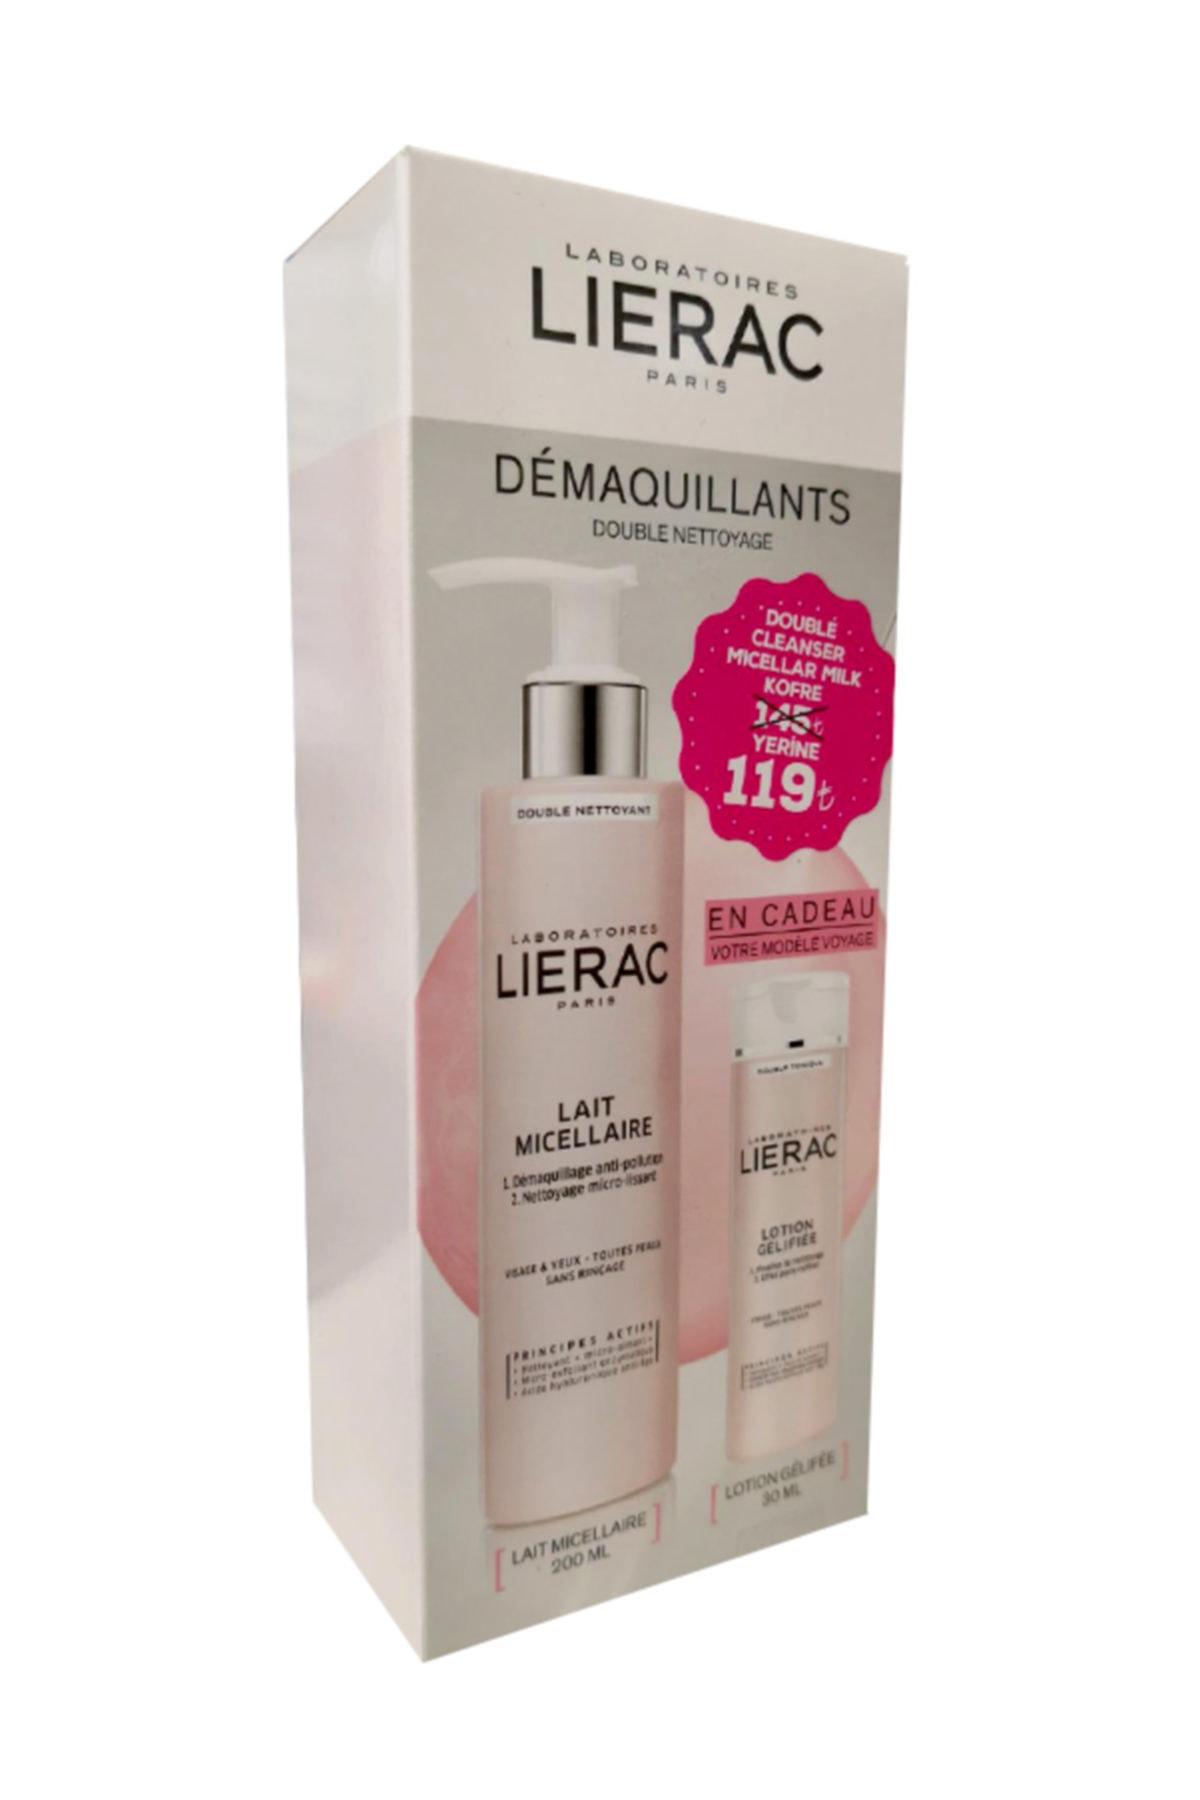 Lierac Micellar Milk Double Cleanser 200 ml + Gel Lotion Double Toning 30 ml 3508240005733 1